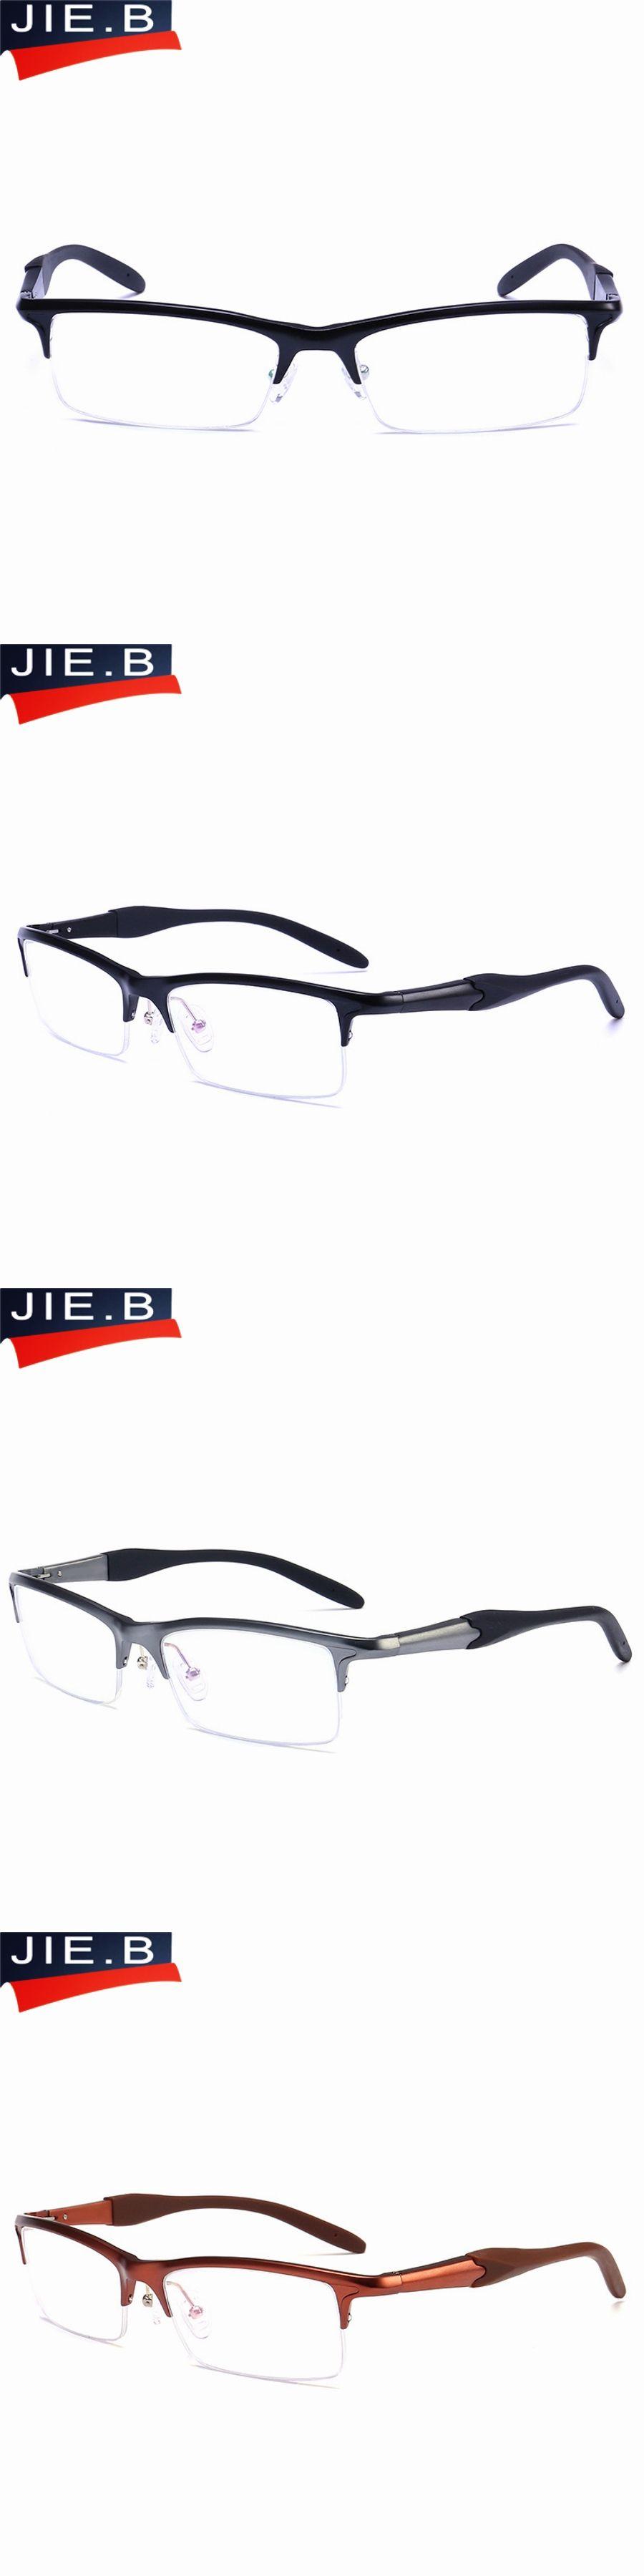 97563acc1c4d B Brand Prescription Glasses Frames Aluminium Magnesium-Alloy Frame  Spectacle Eyeglasses Myopia Glasses